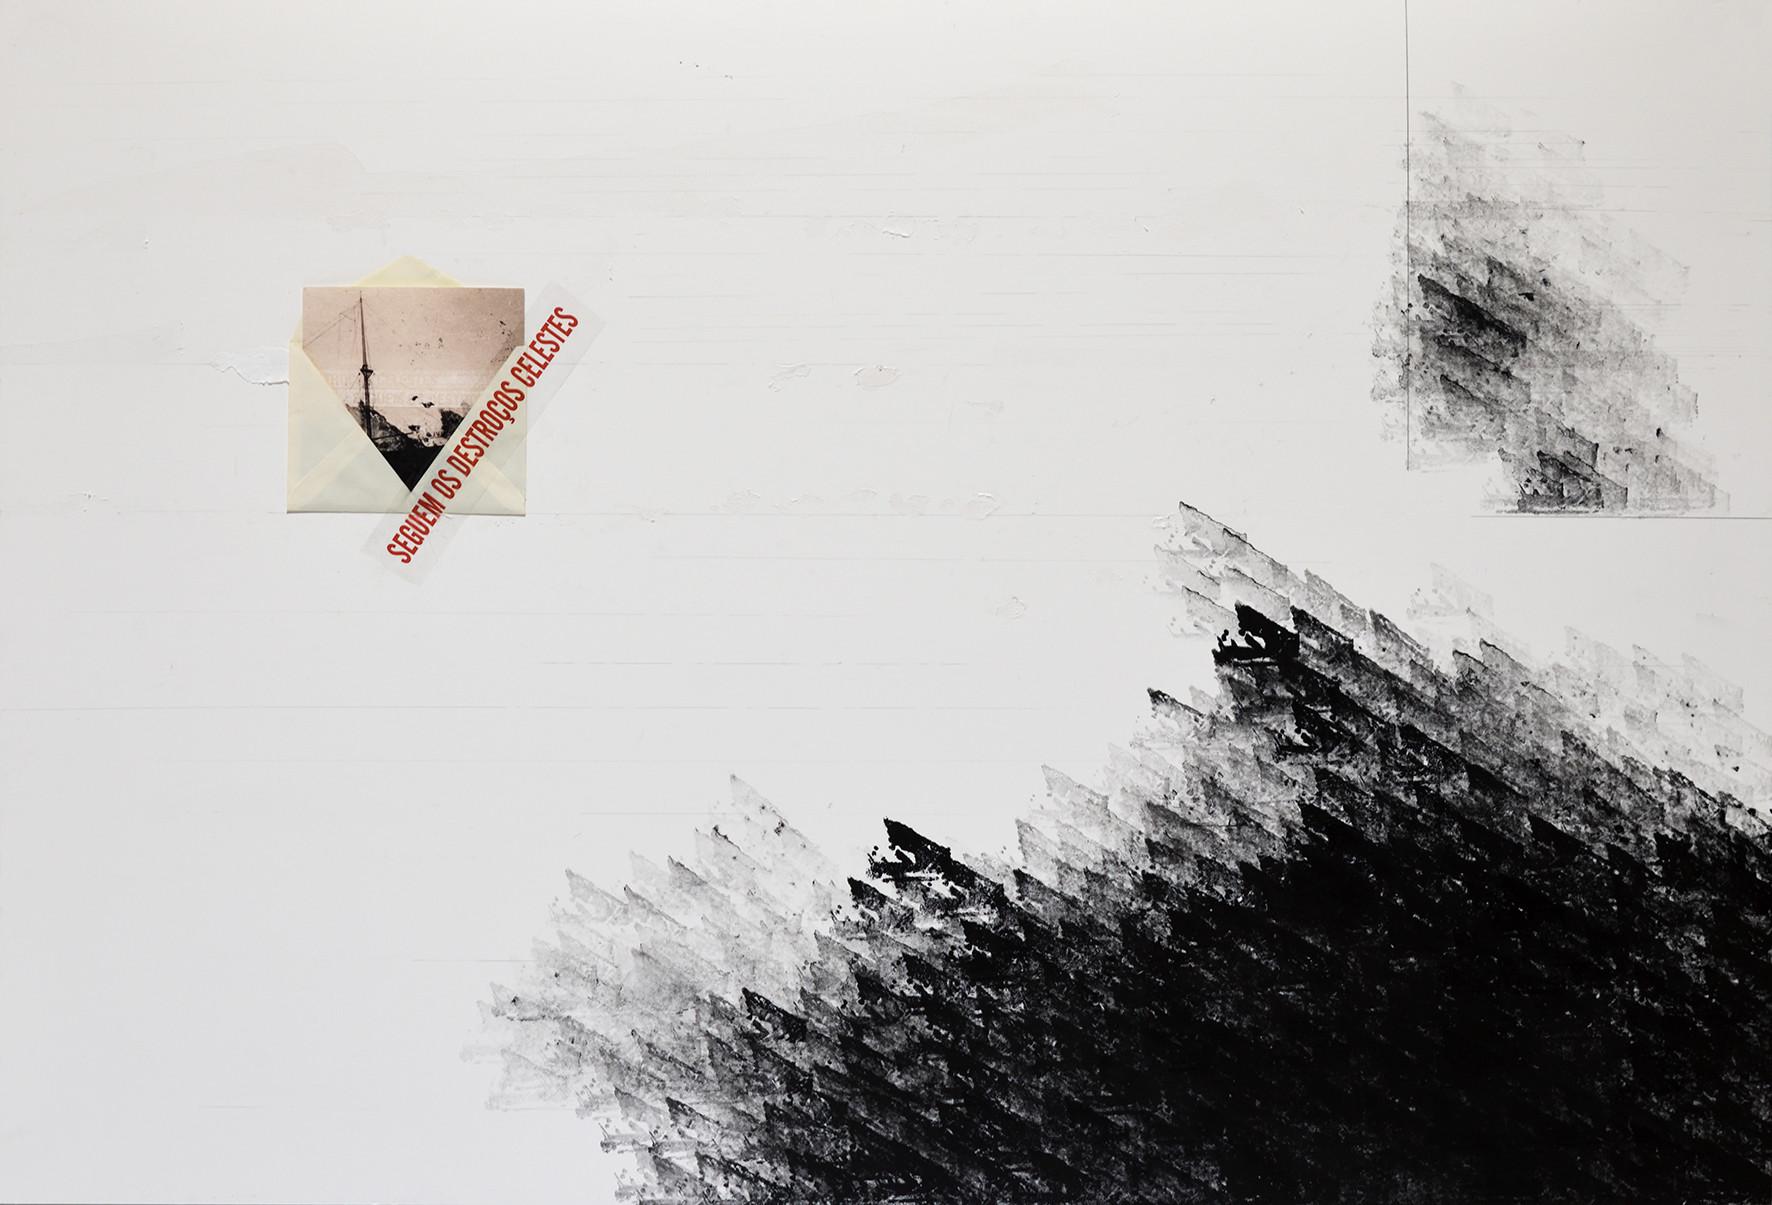 Almanzora [2018] carimbo, envelope, fotografia, fita adesiva sobre cartão  rubber stamp, envelope, photograph, scotch tape on cardboard, 120 x 80 cm